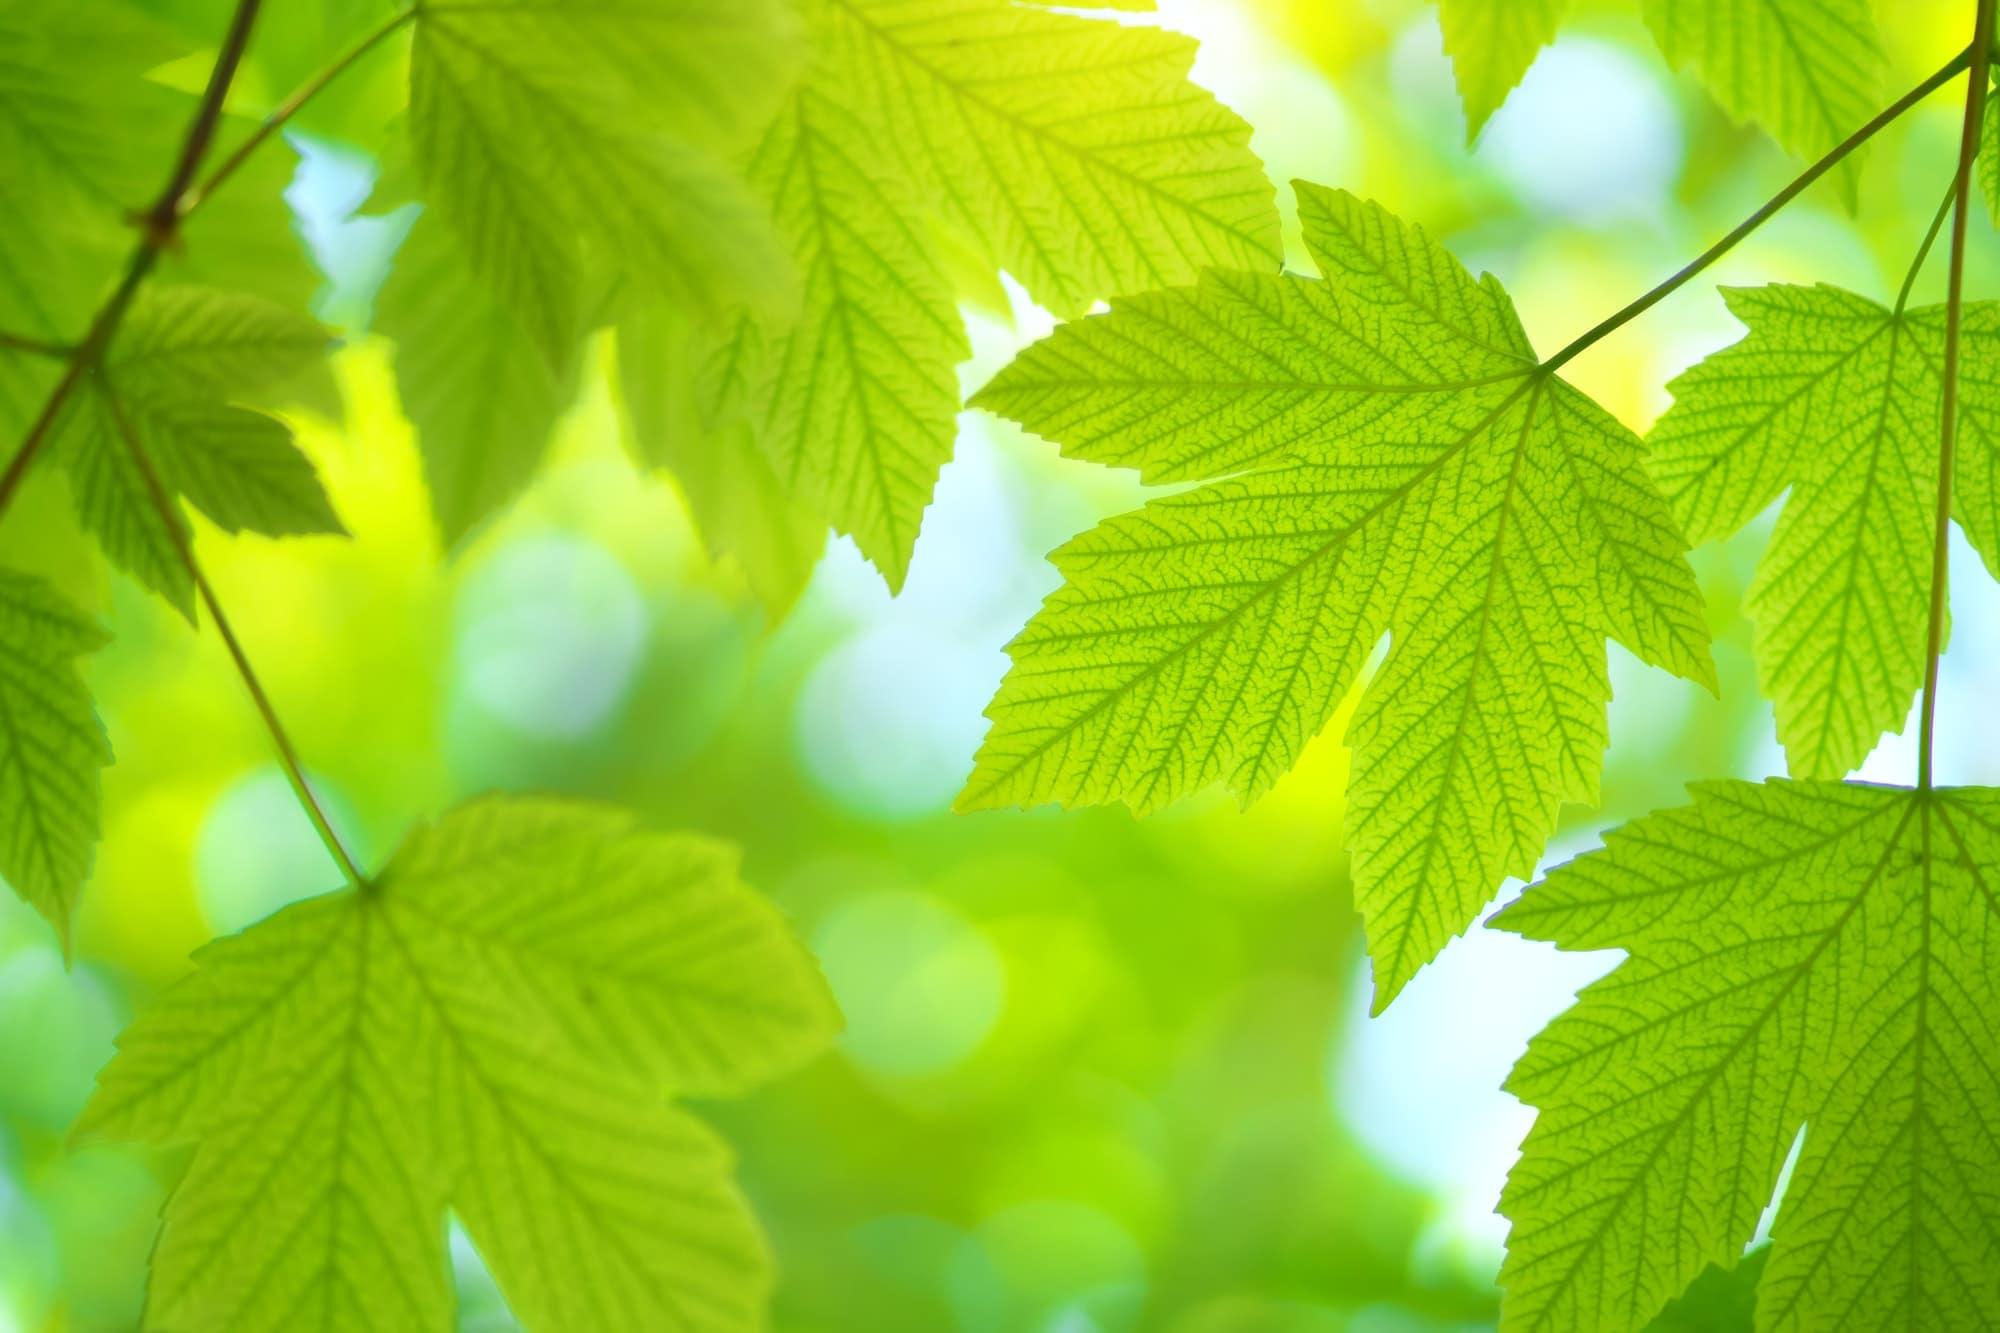 Green spring leaf of maple